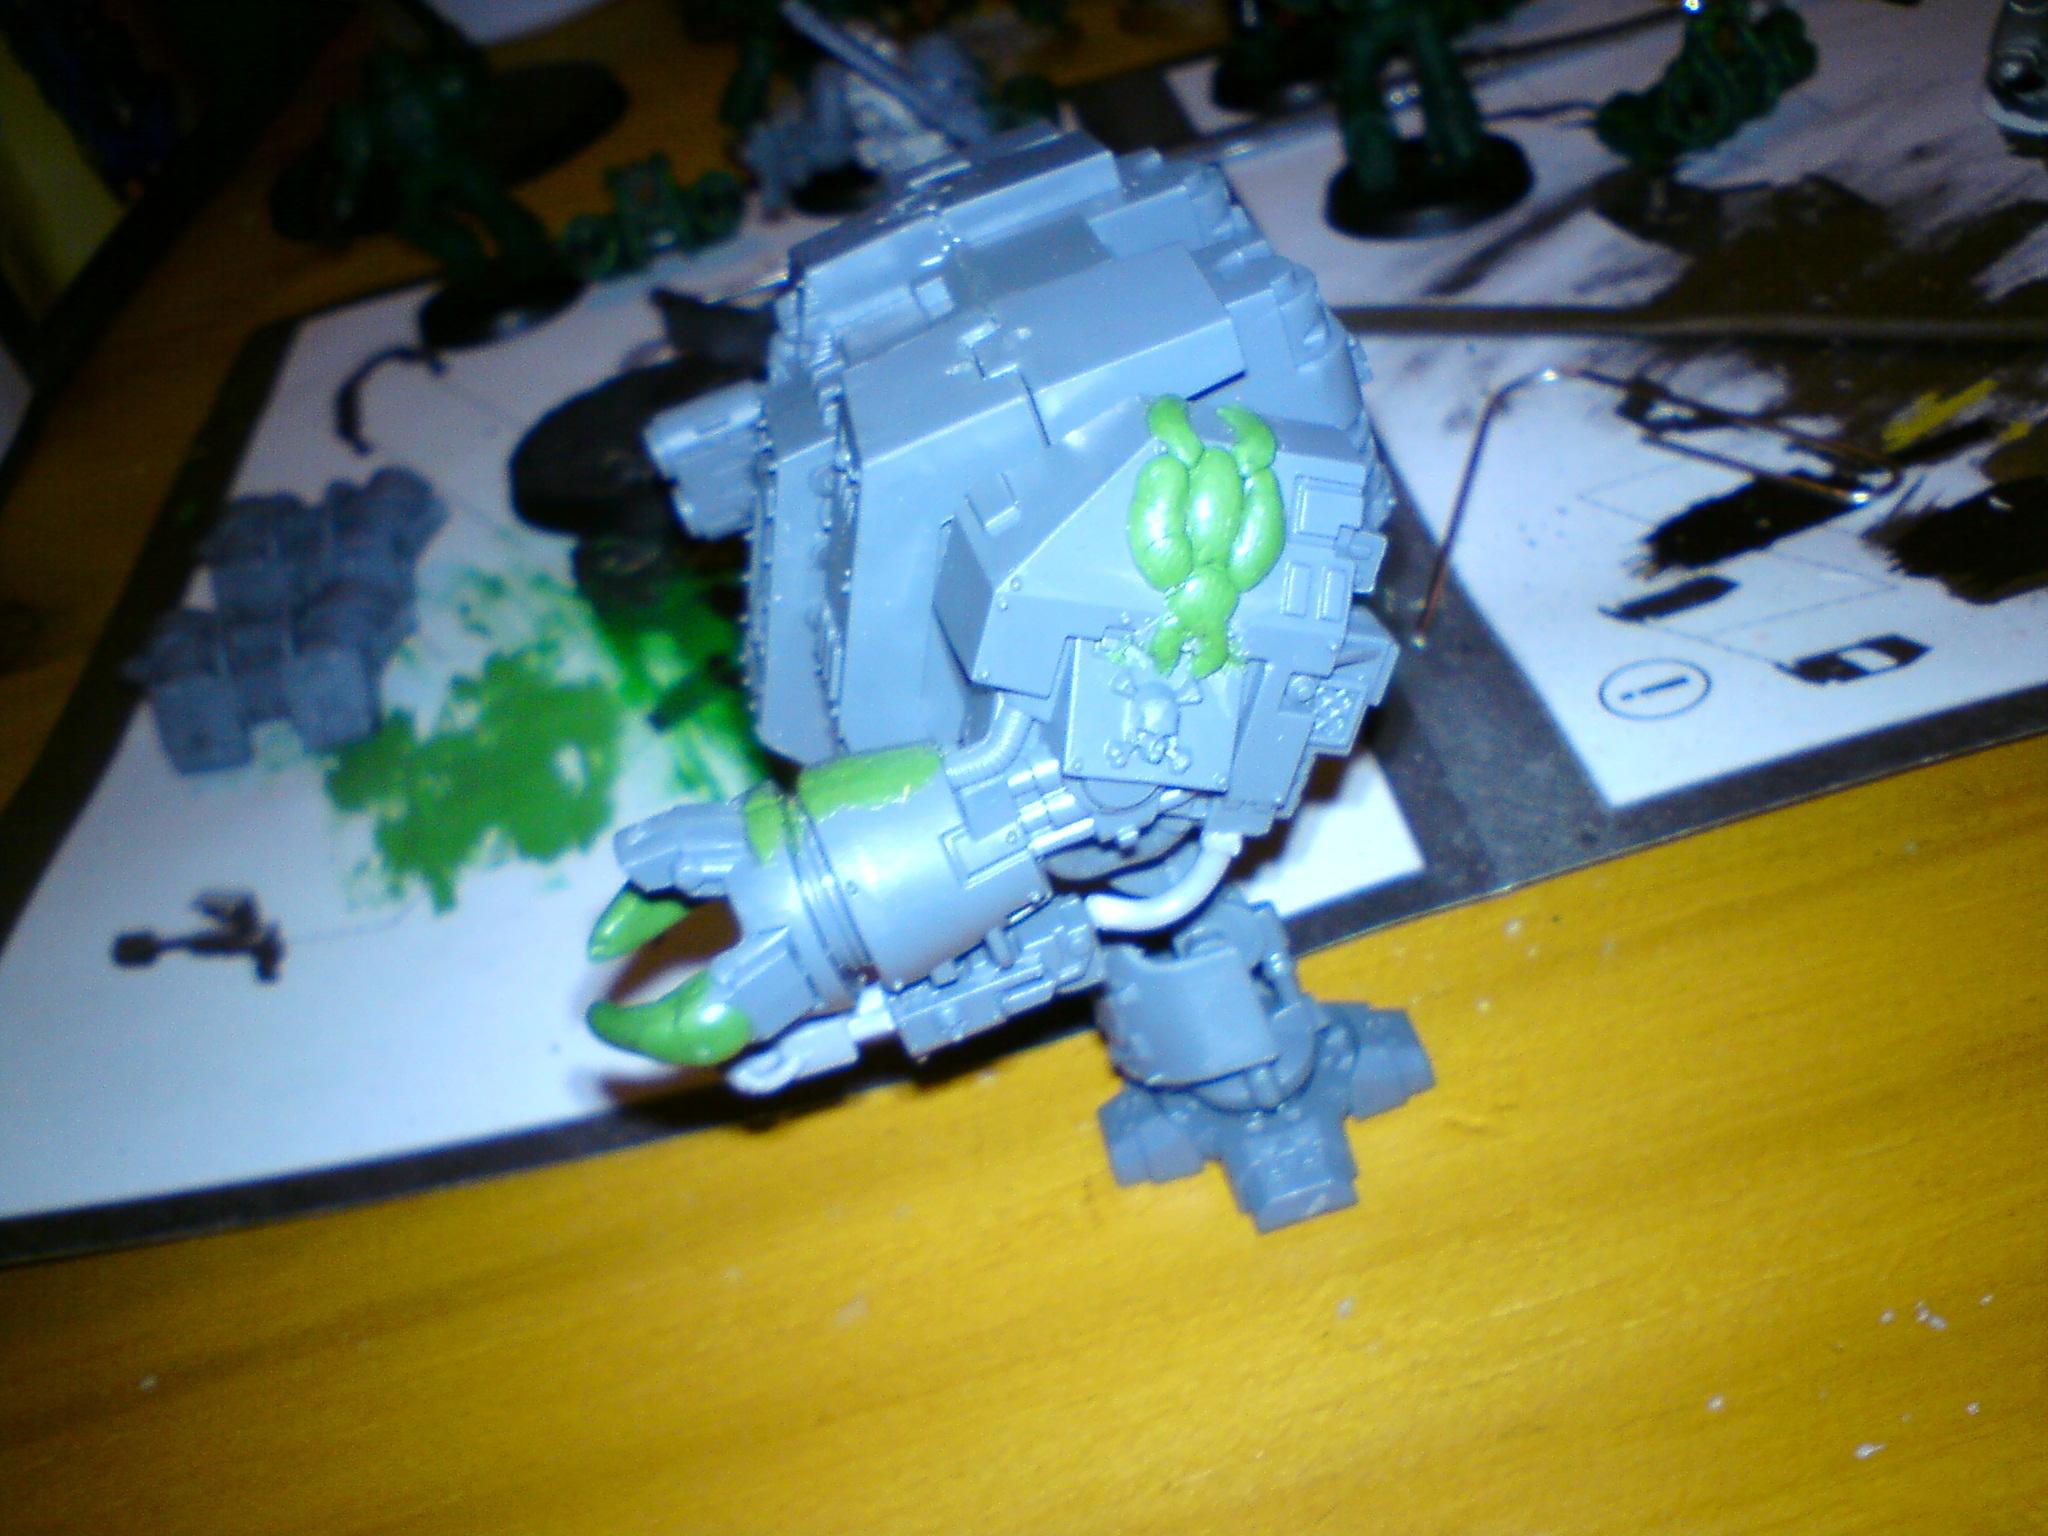 Dreadnought, Mantis, Space Marines, Warriors